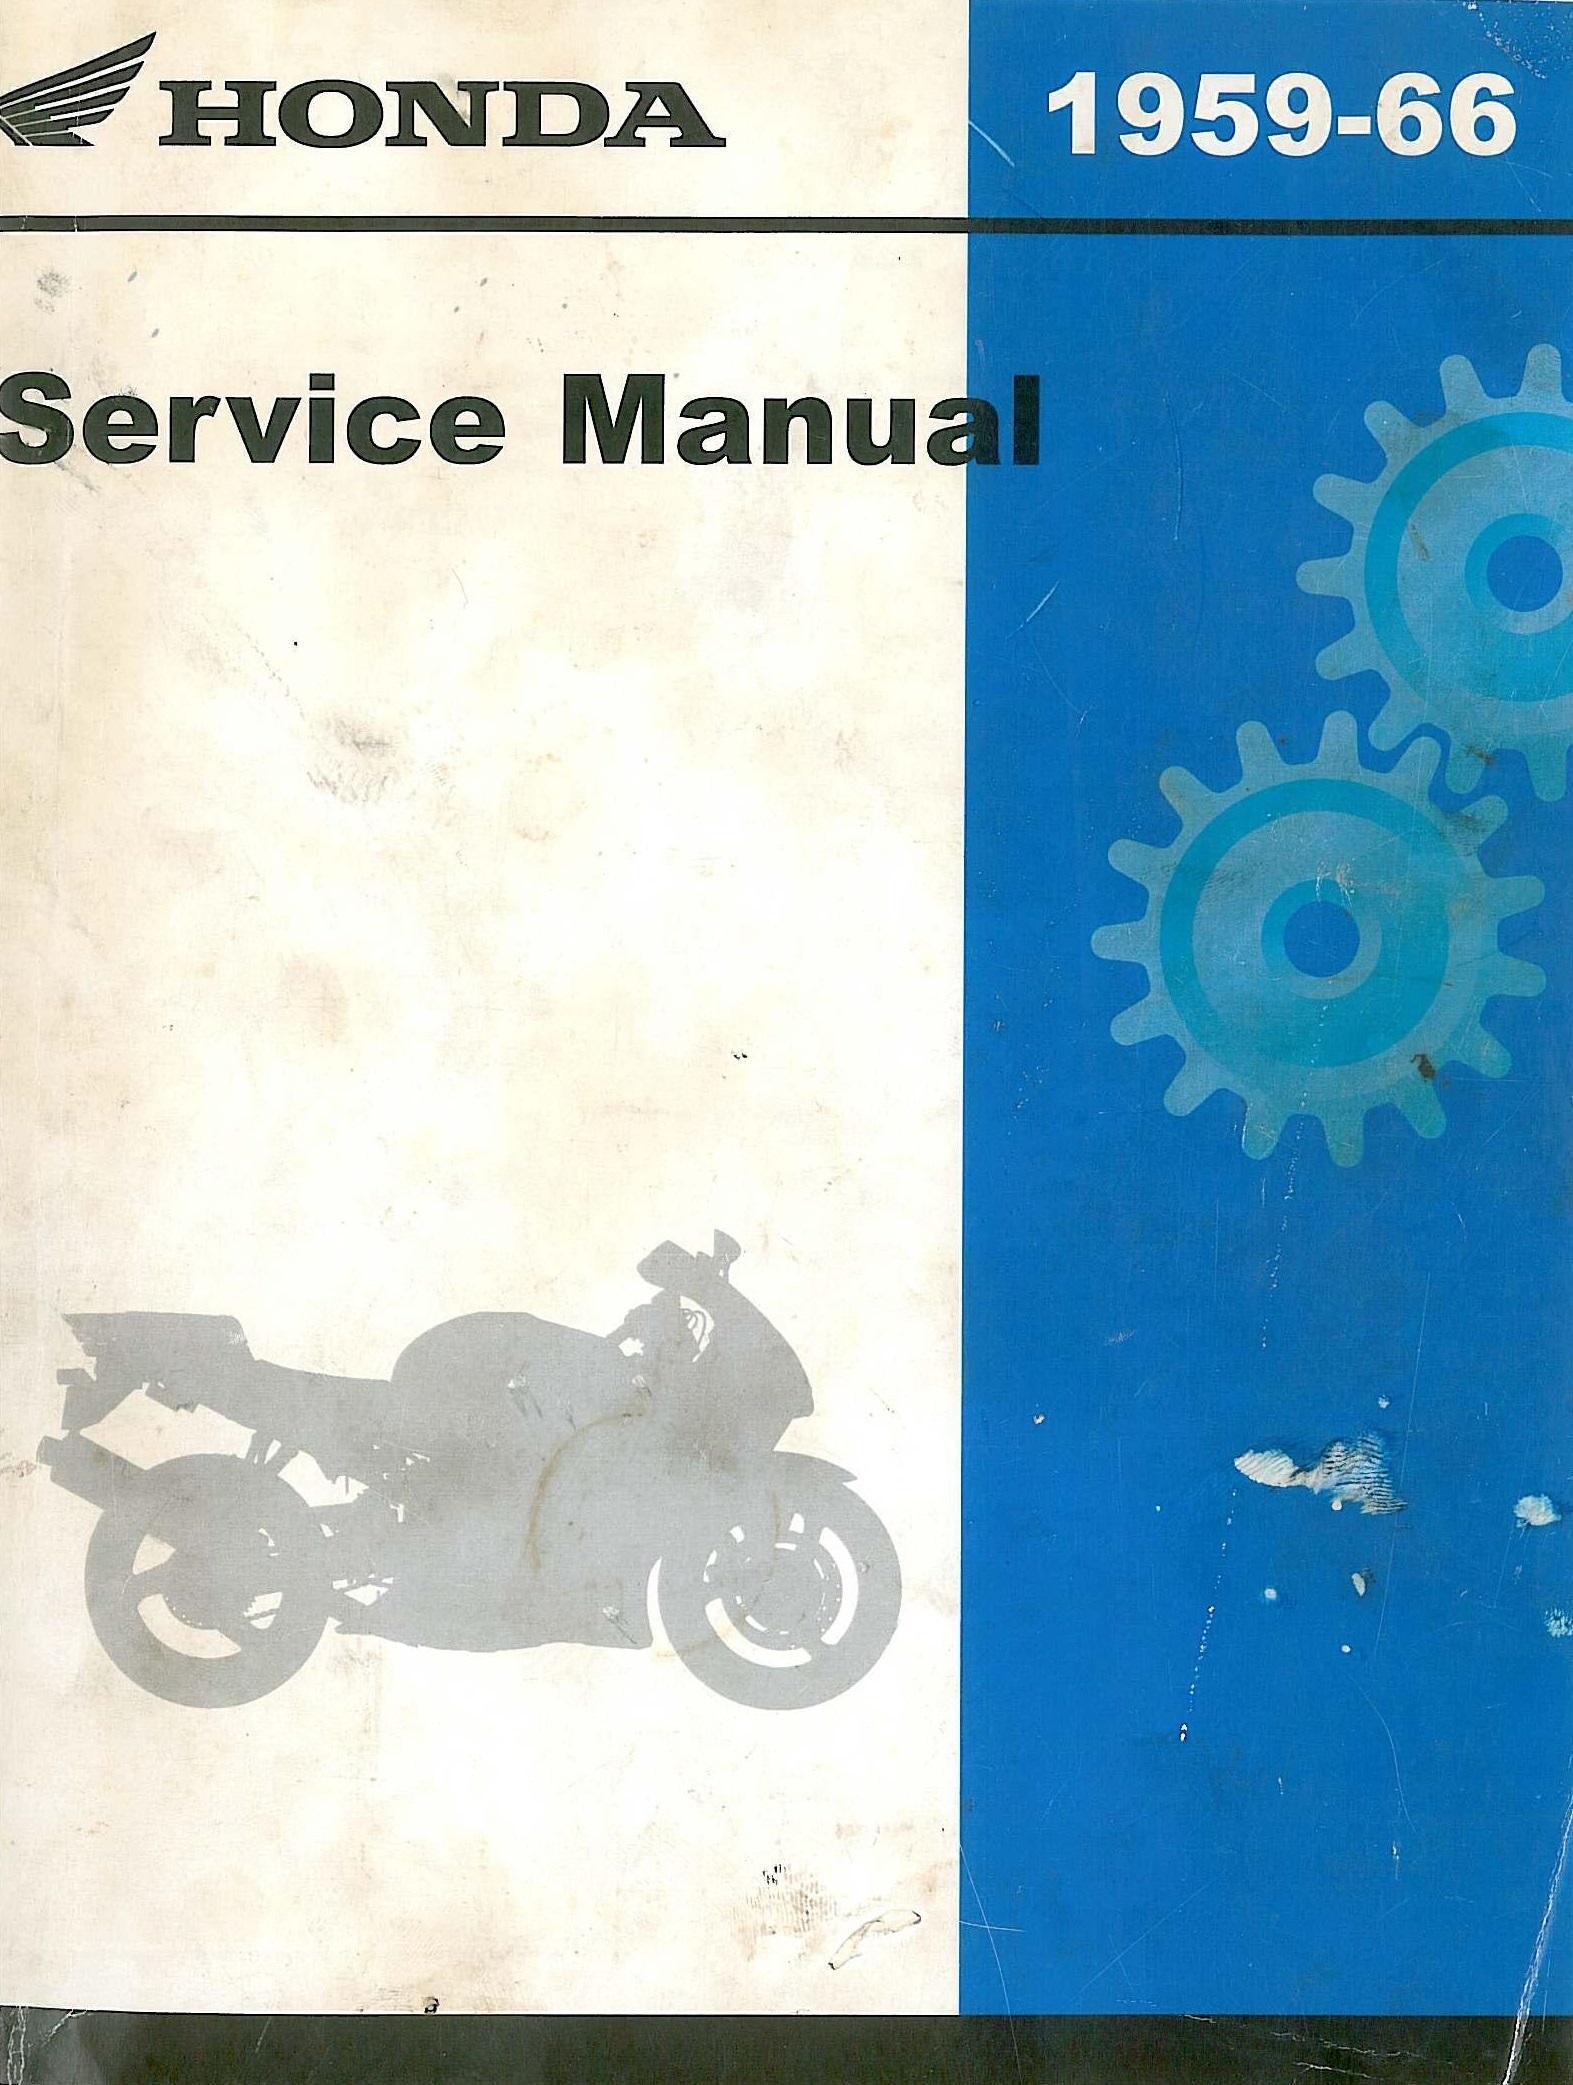 Workshopmanual For Honda CB92 (1959-1966)